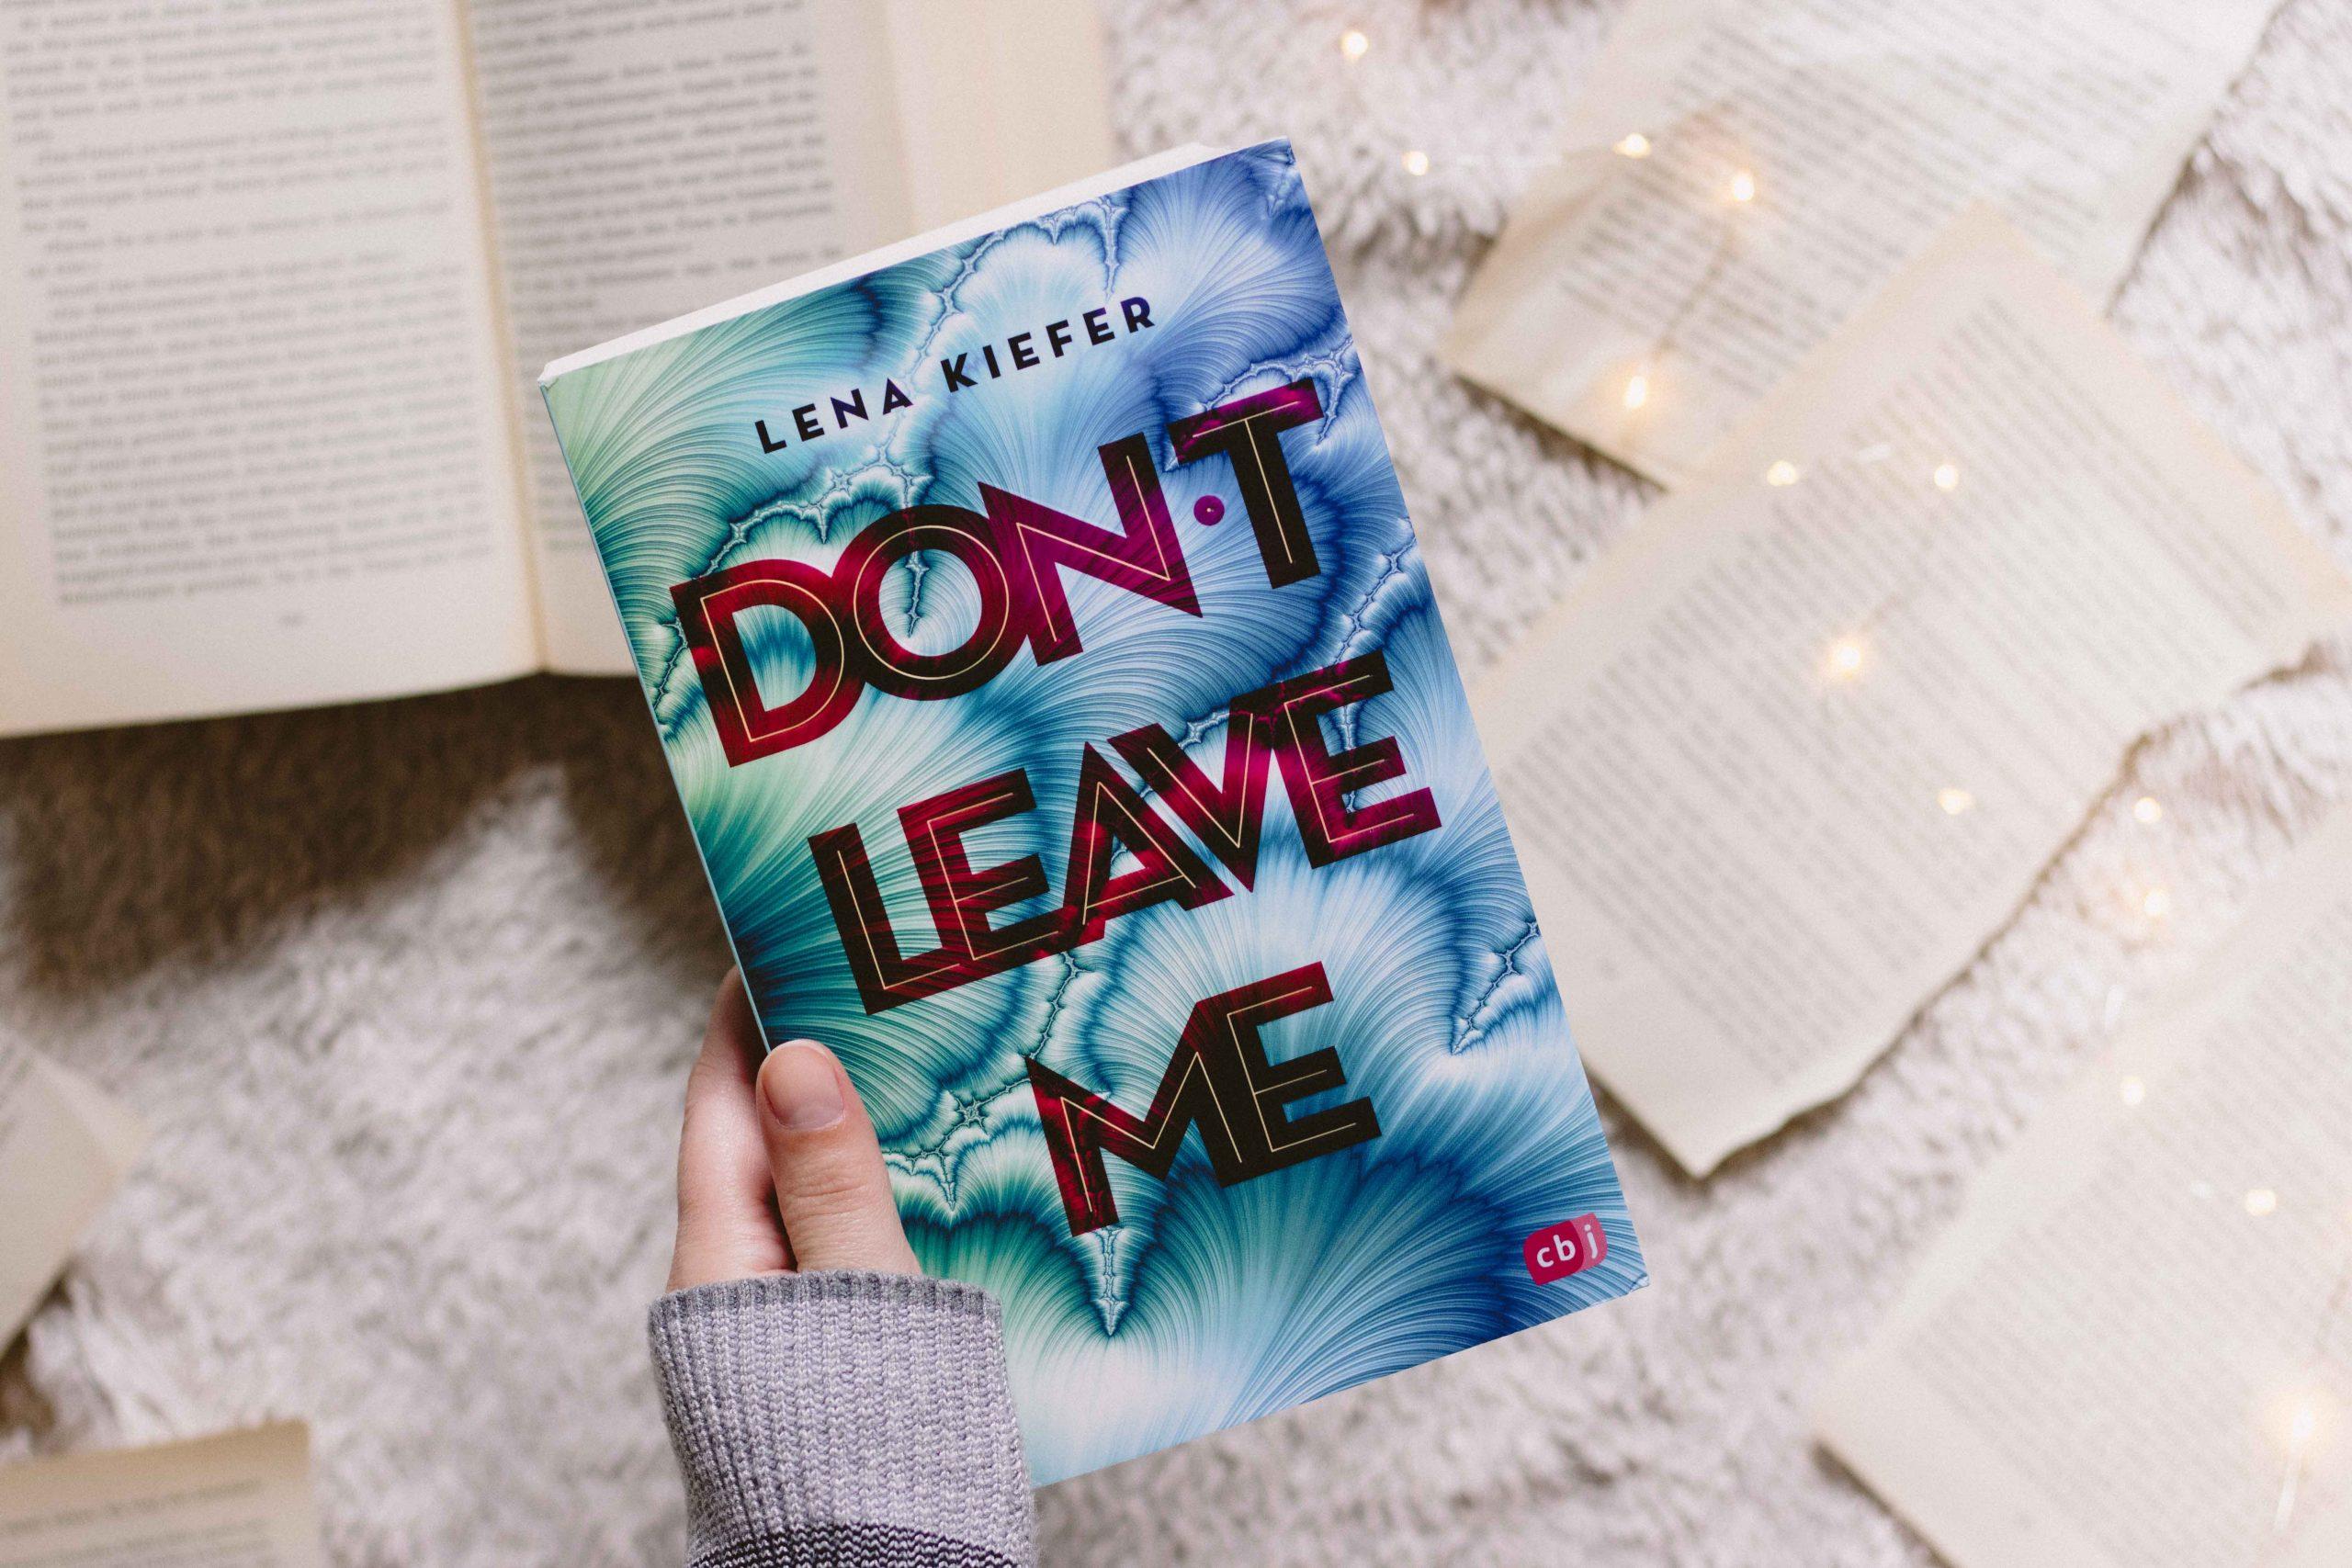 Don't leave me – Don't Reihe #3 | Lena Kiefer